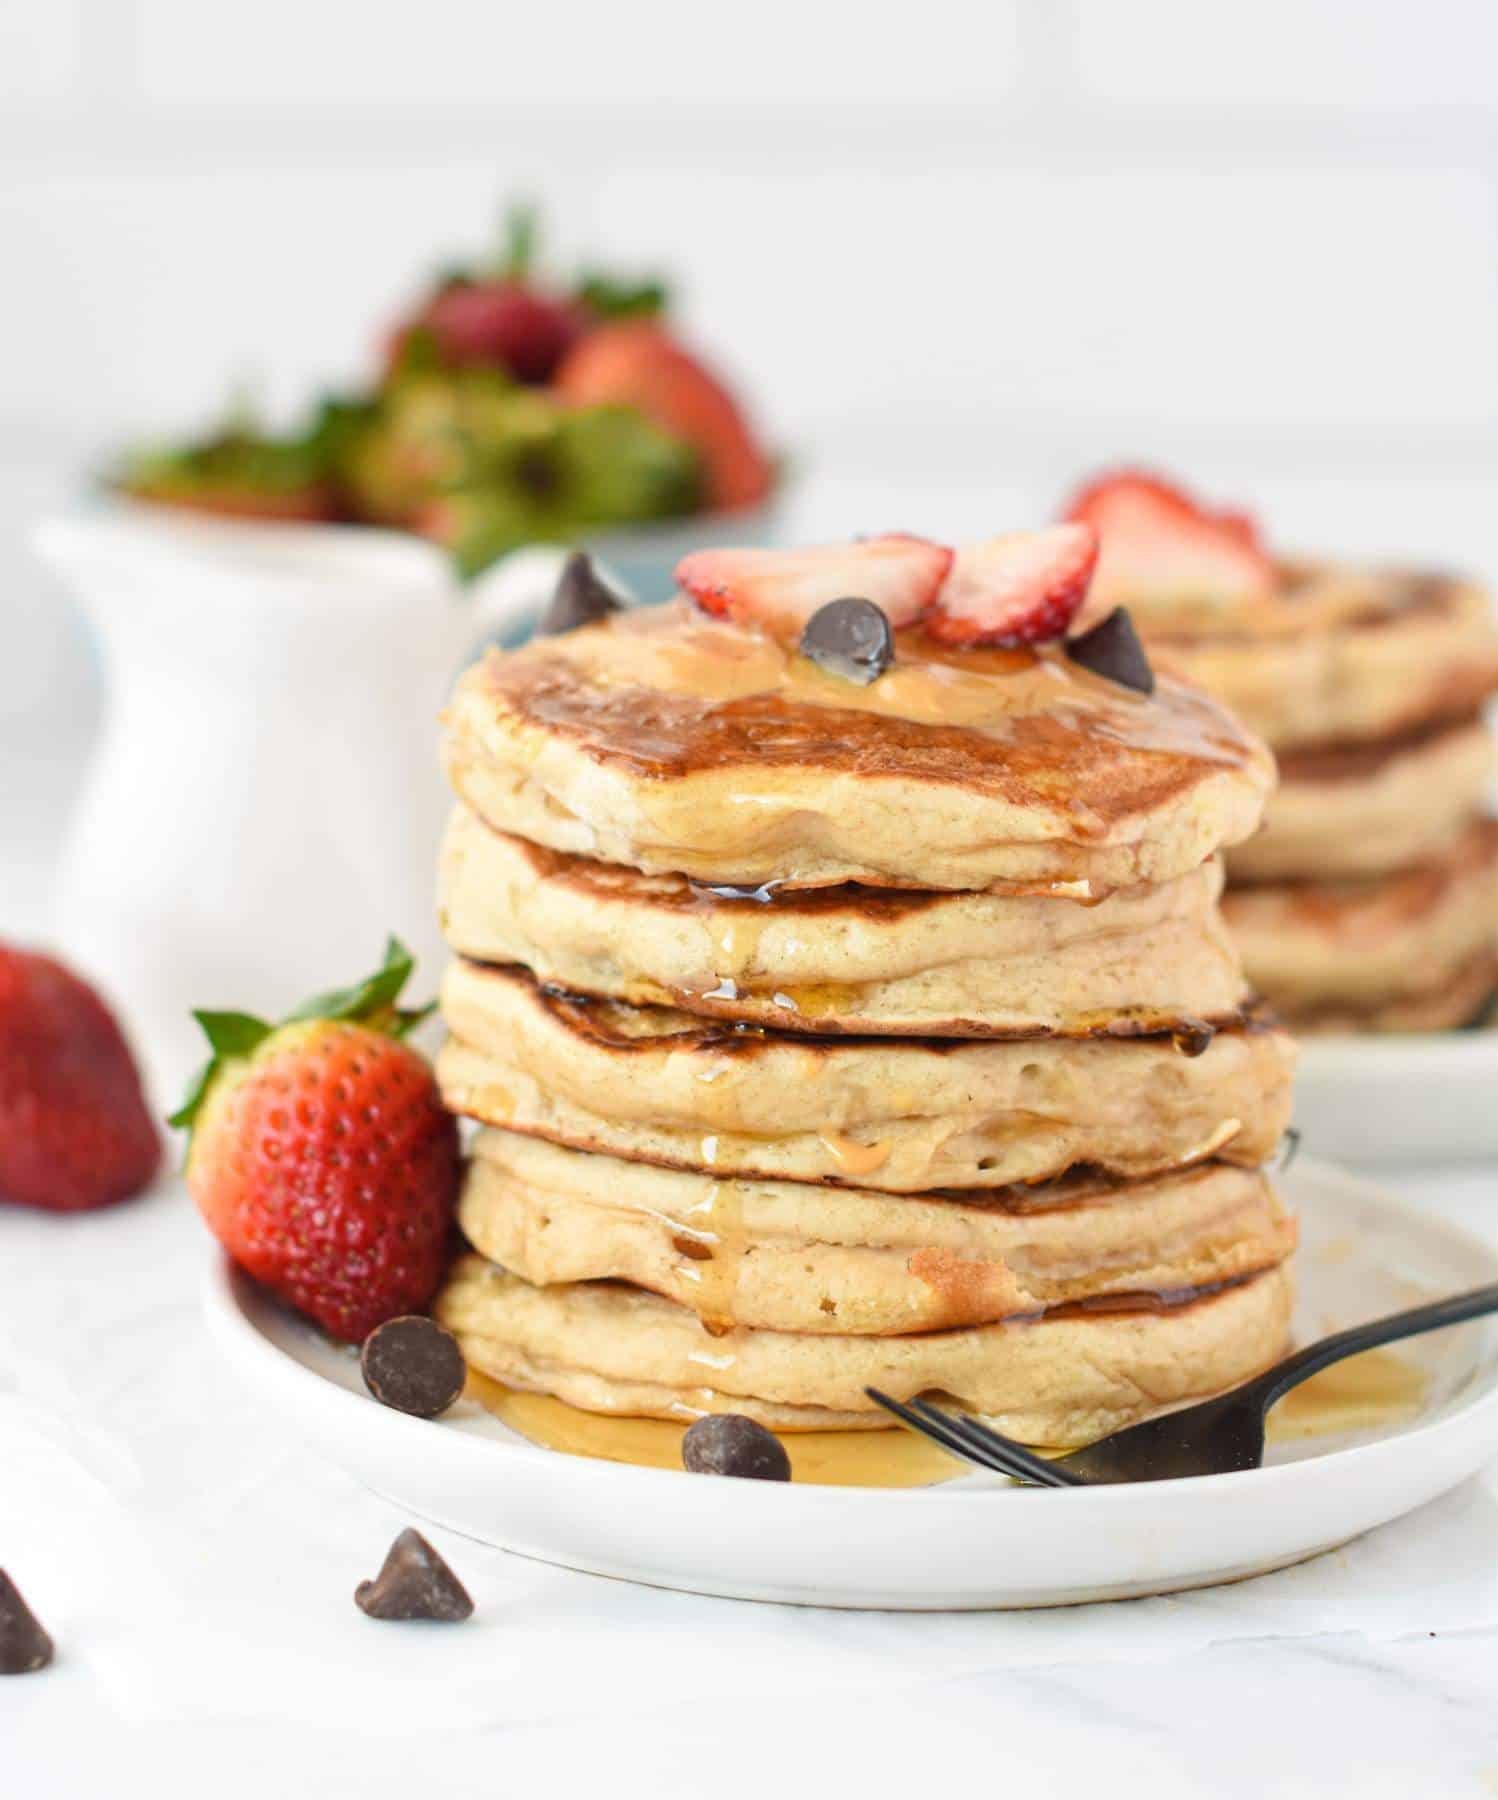 Vegan pancakes with protein powderVegan pancakes with protein powder